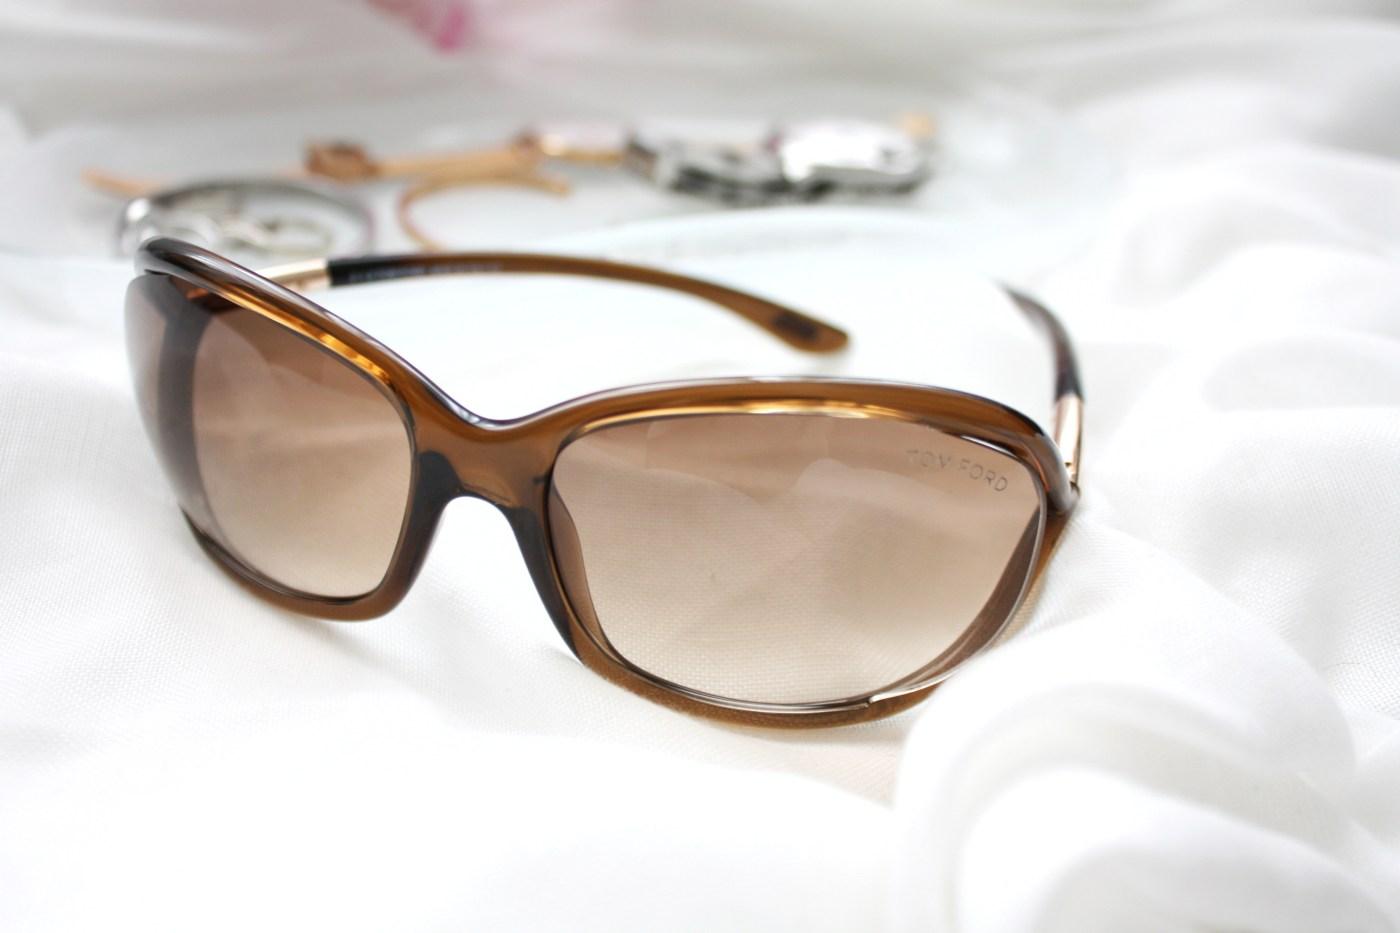 SmartBuyGlasses – Tom Ford Sunglasses